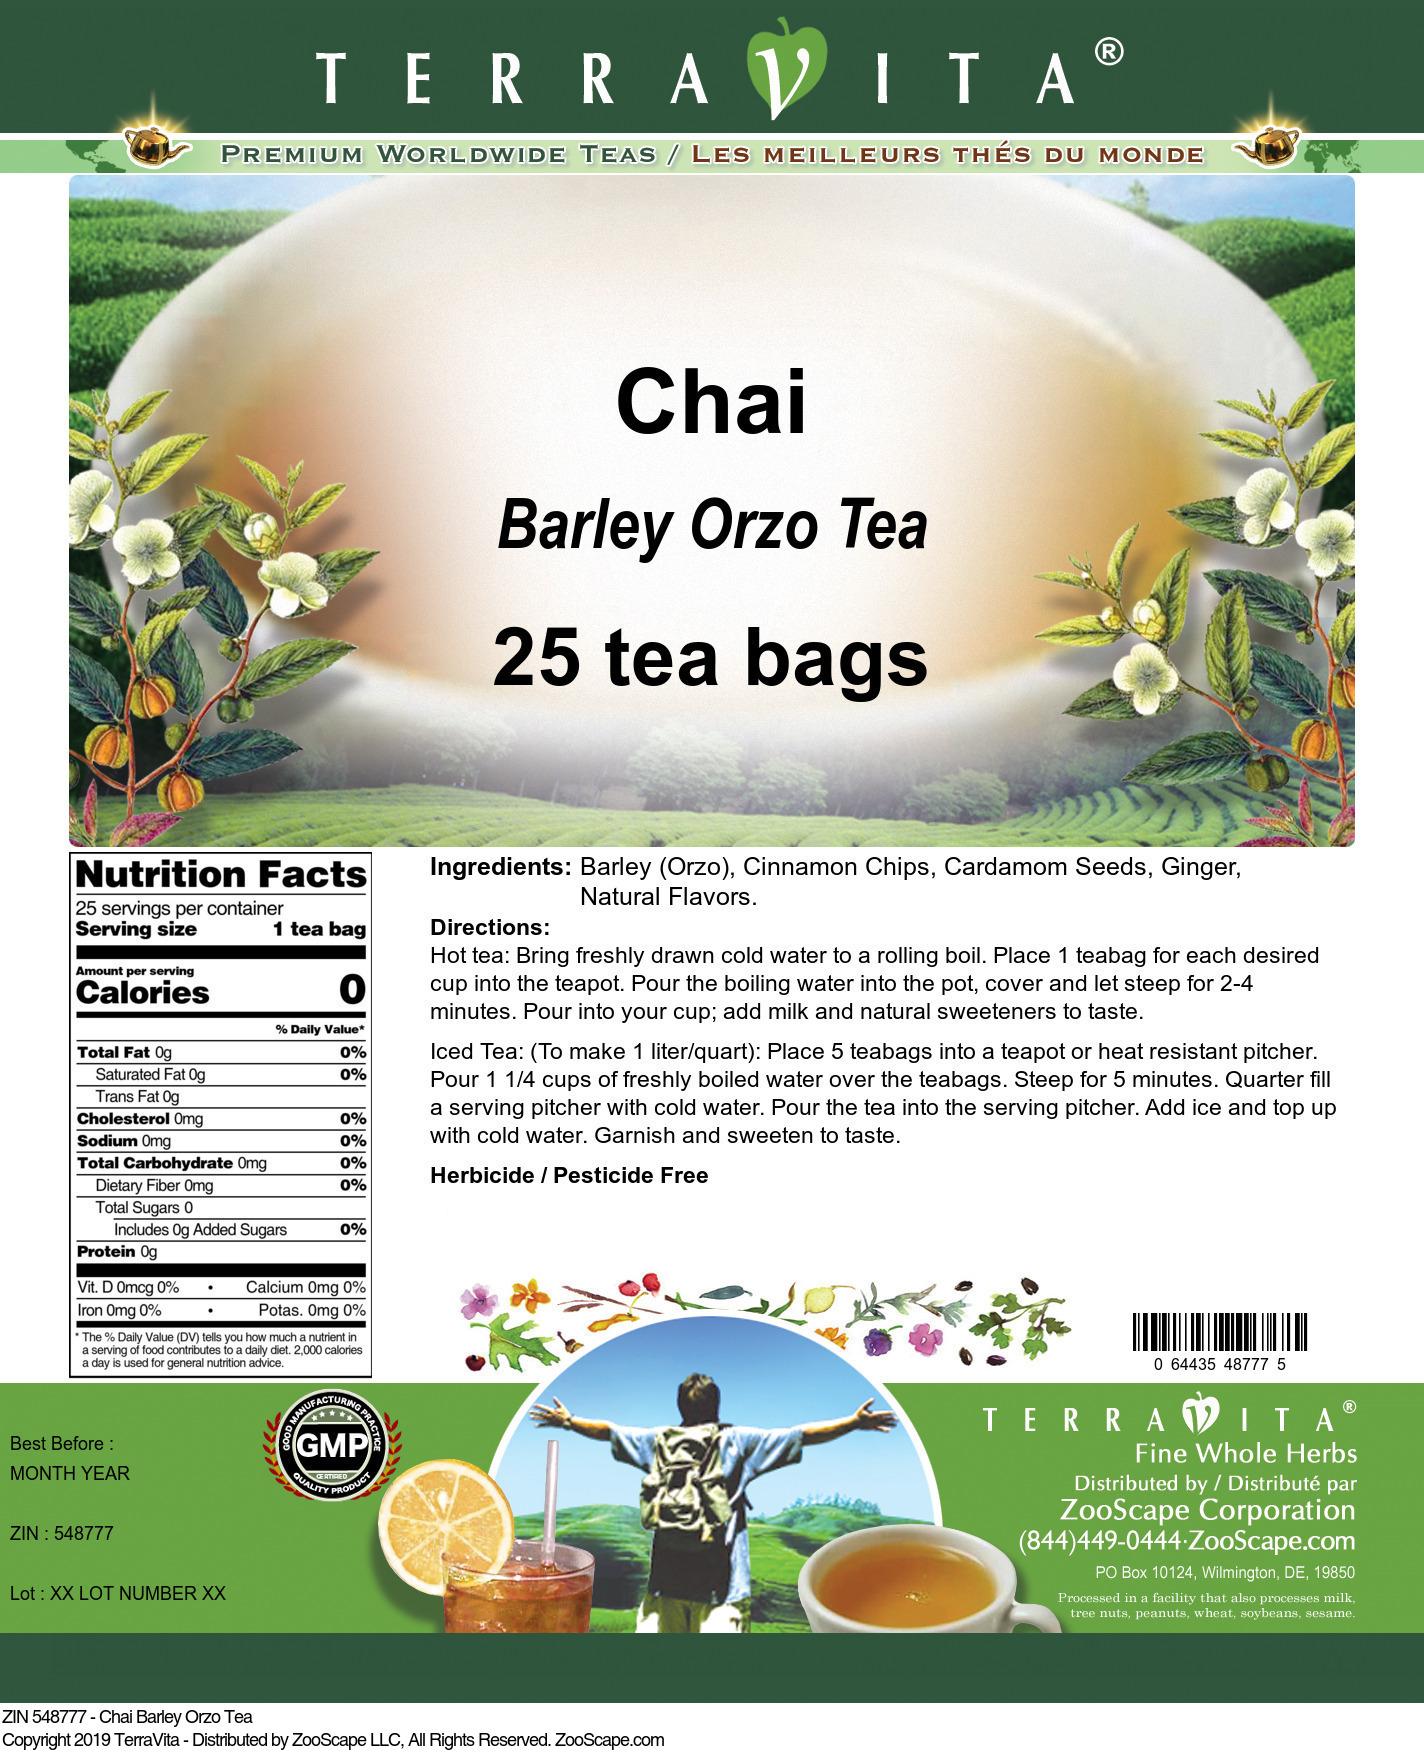 Chai Barley Orzo Tea